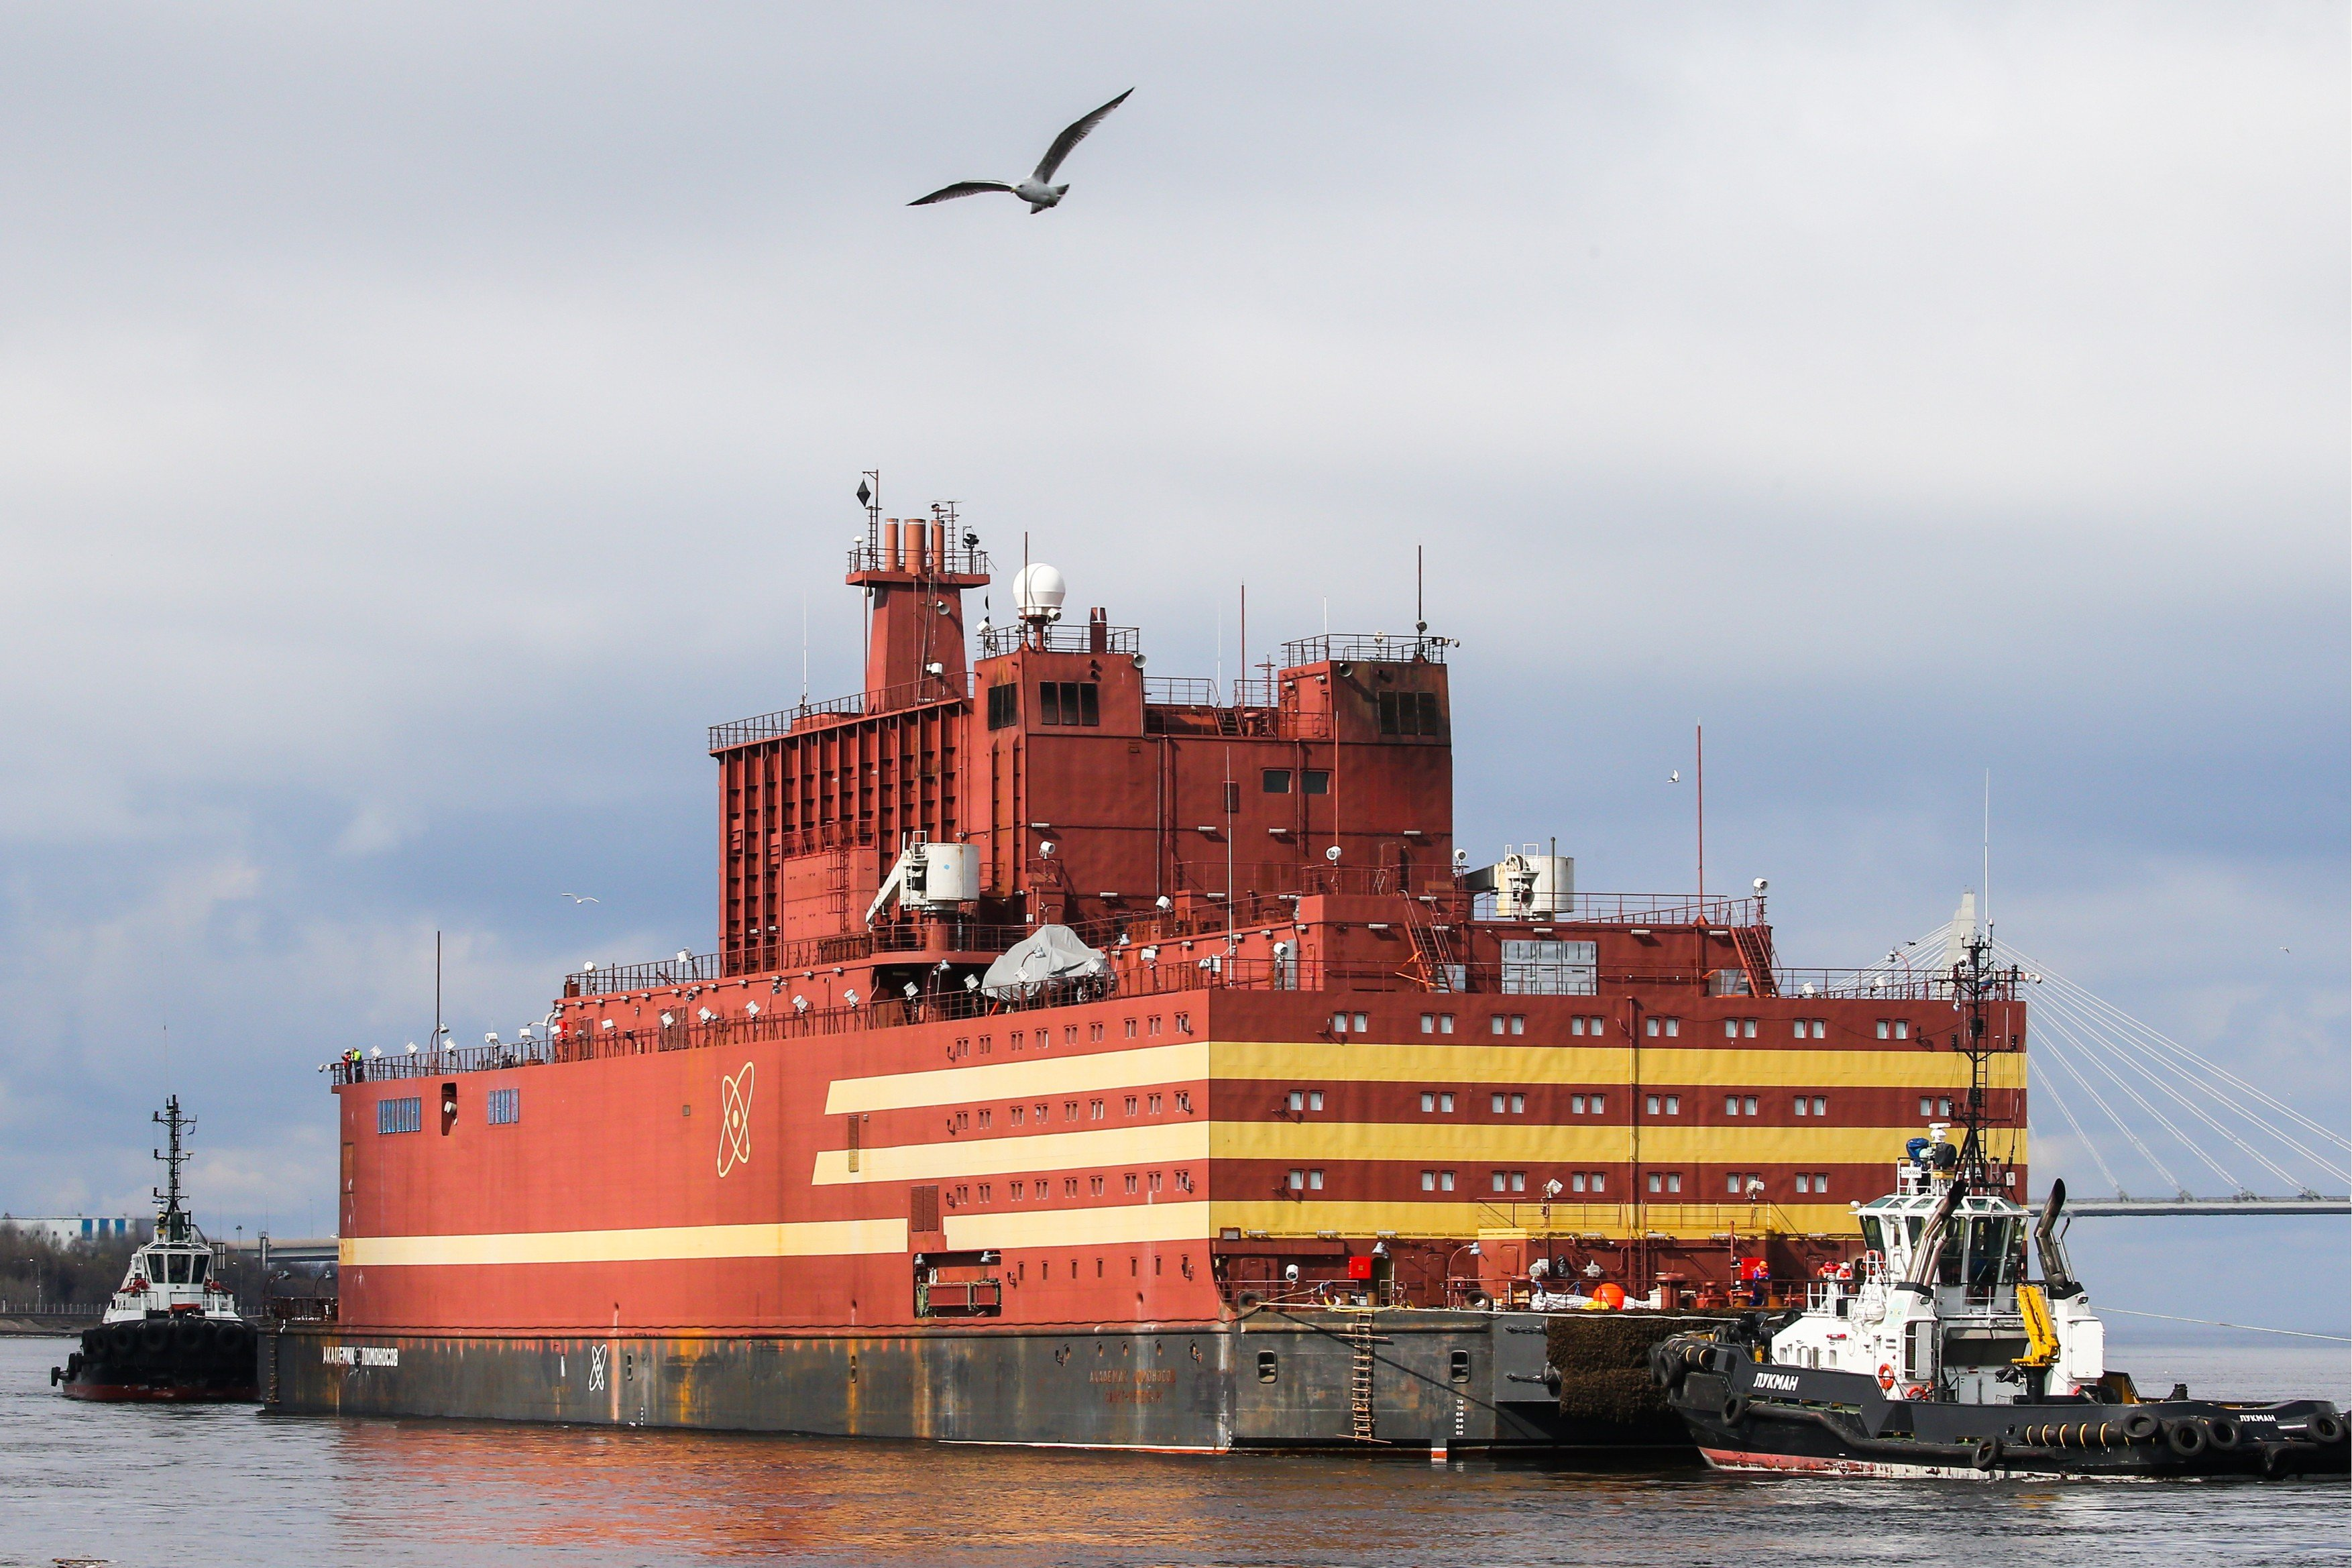 Ruská plovoucí atomová elektrárna Akademik Lomonosov